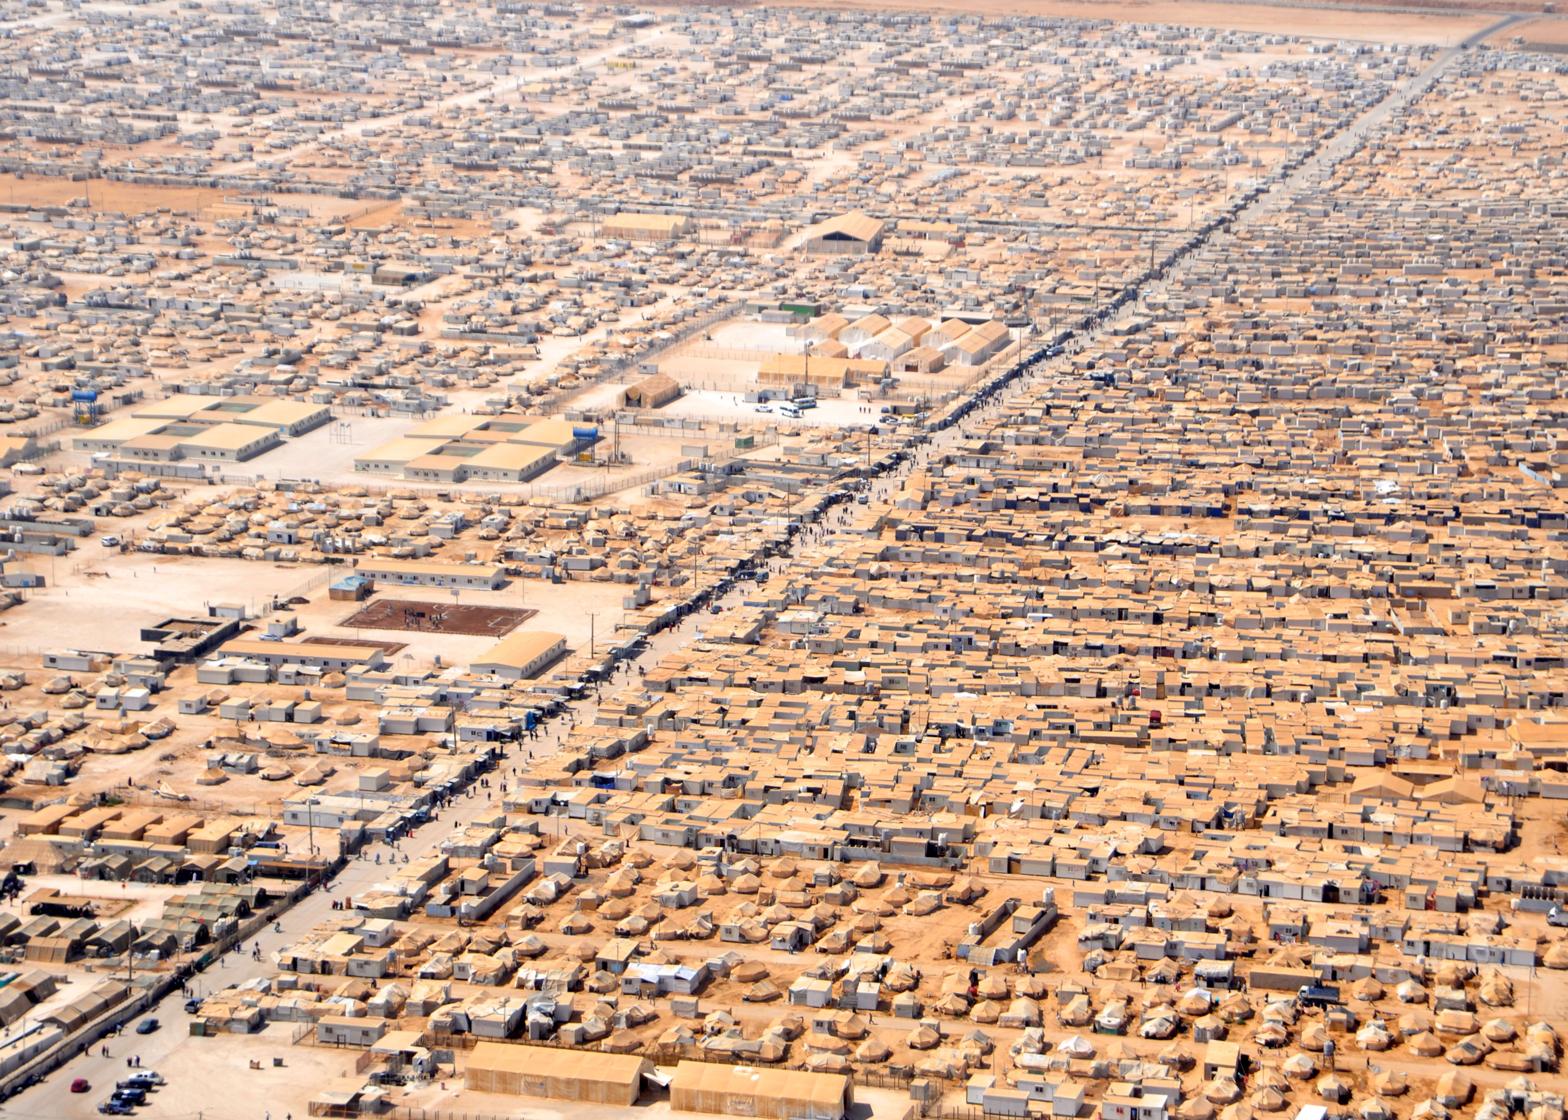 The Zaatari refugee camp in Jordan